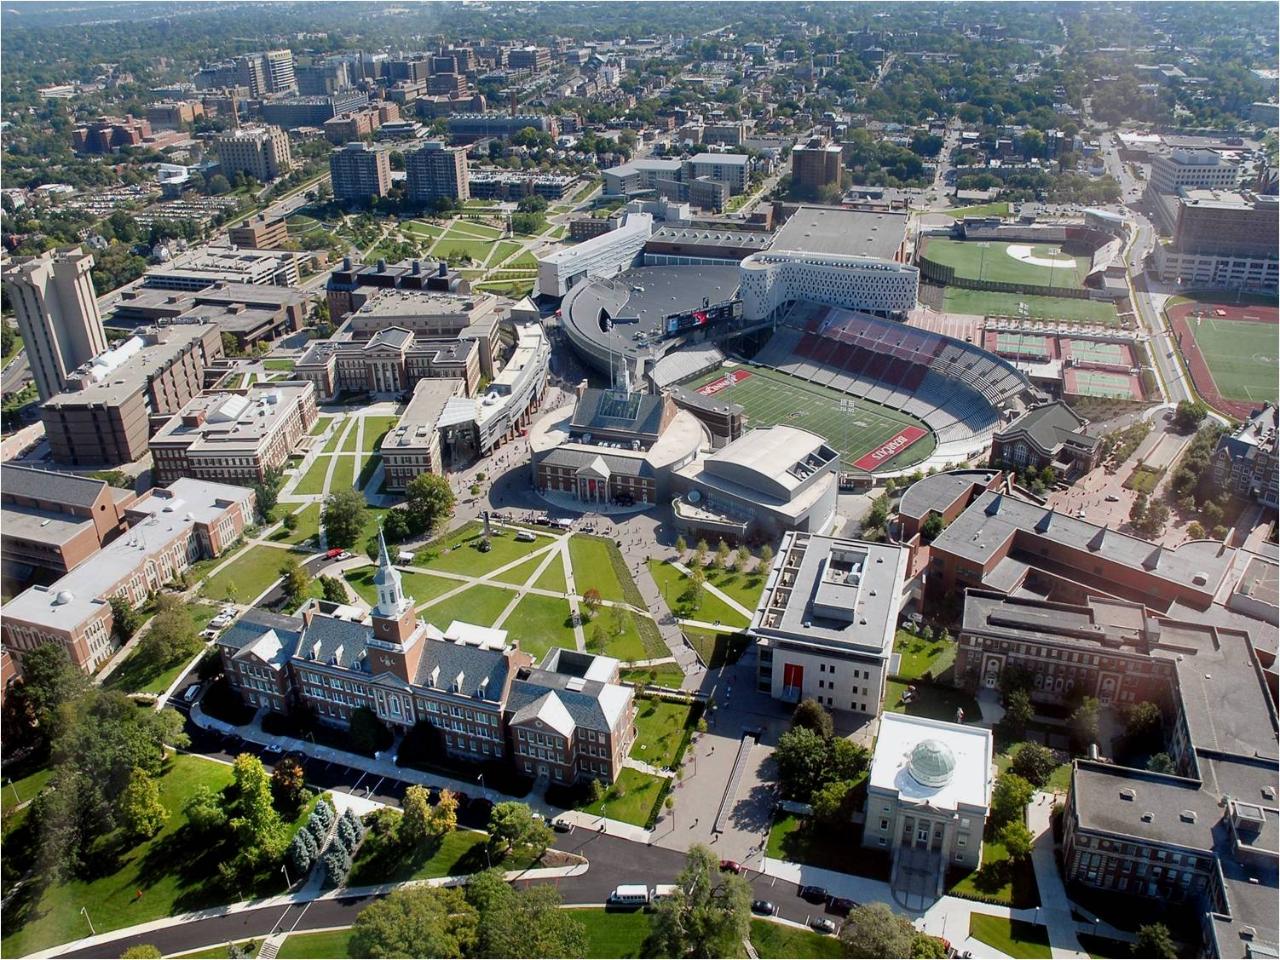 The University of Cincinnati's uptown campus in Clifton.